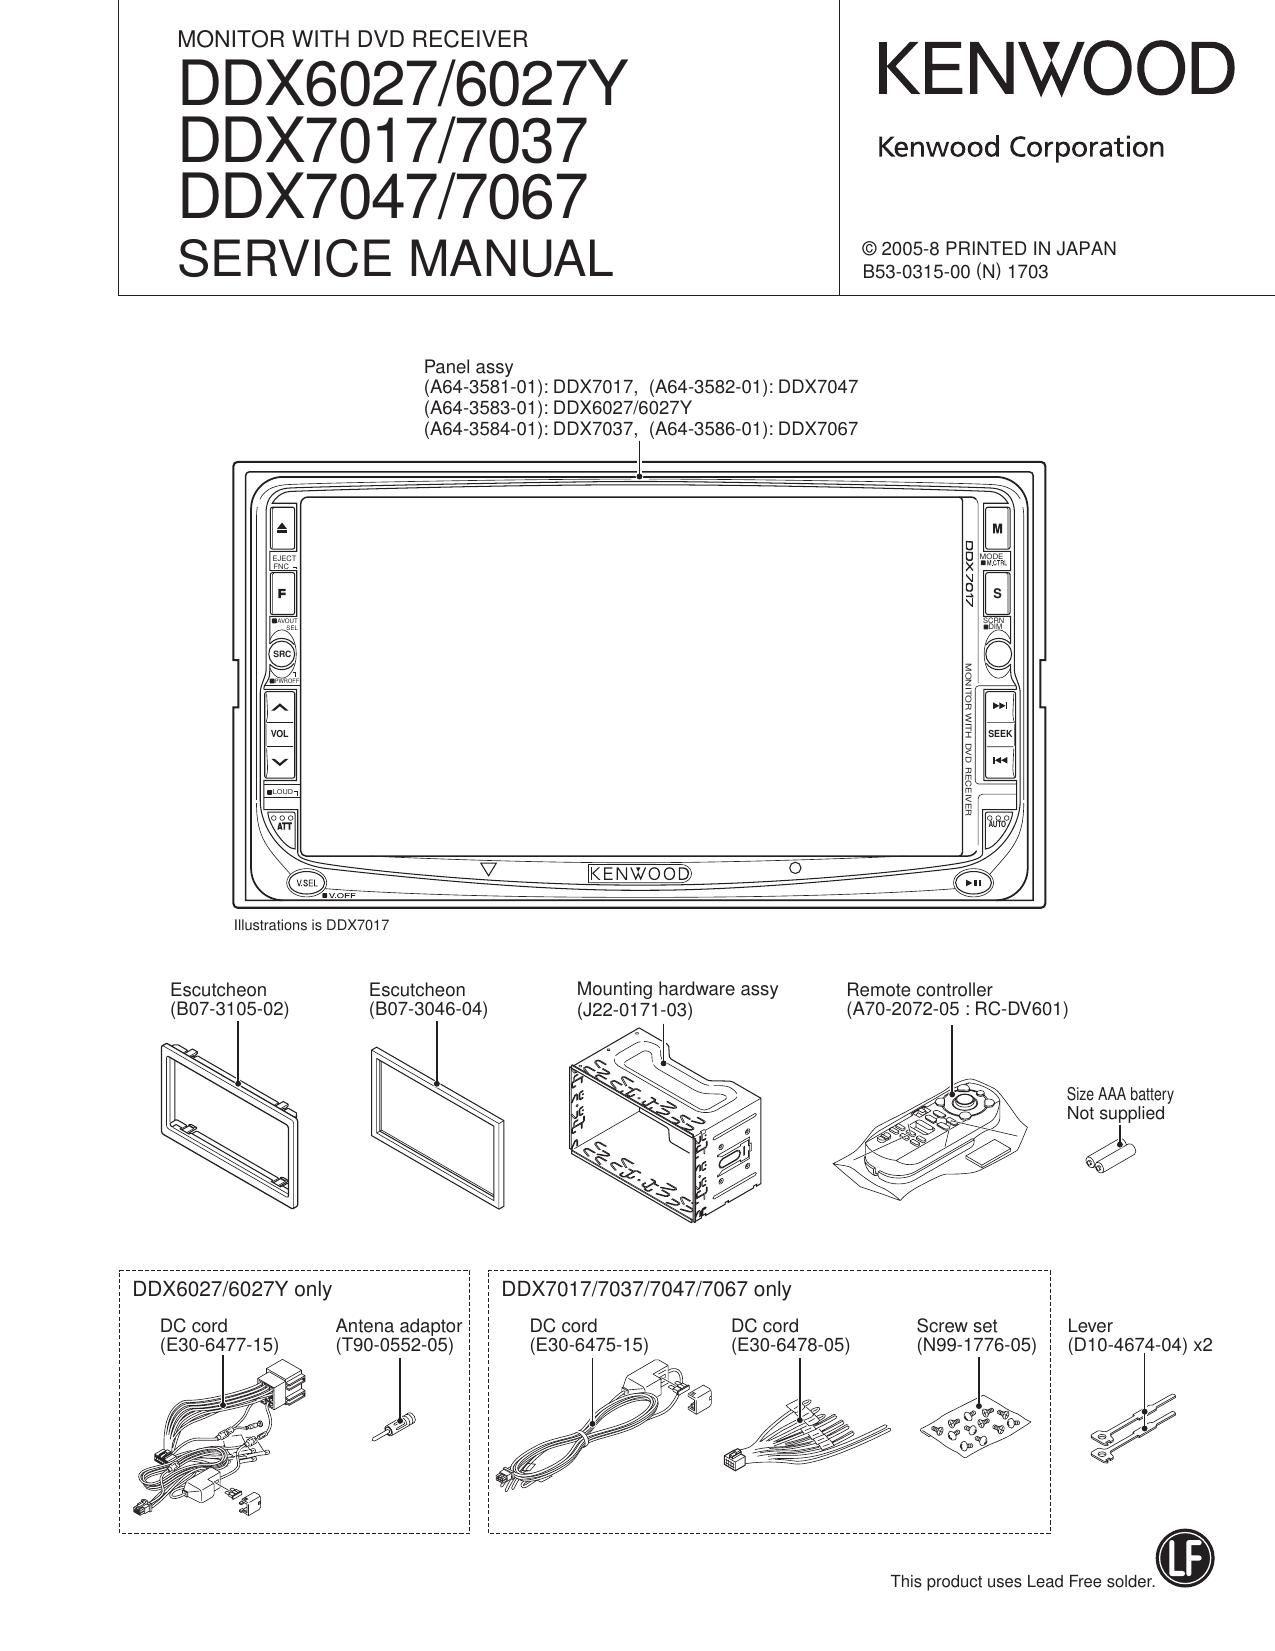 Kenwood DDX 7067 Service Manual on